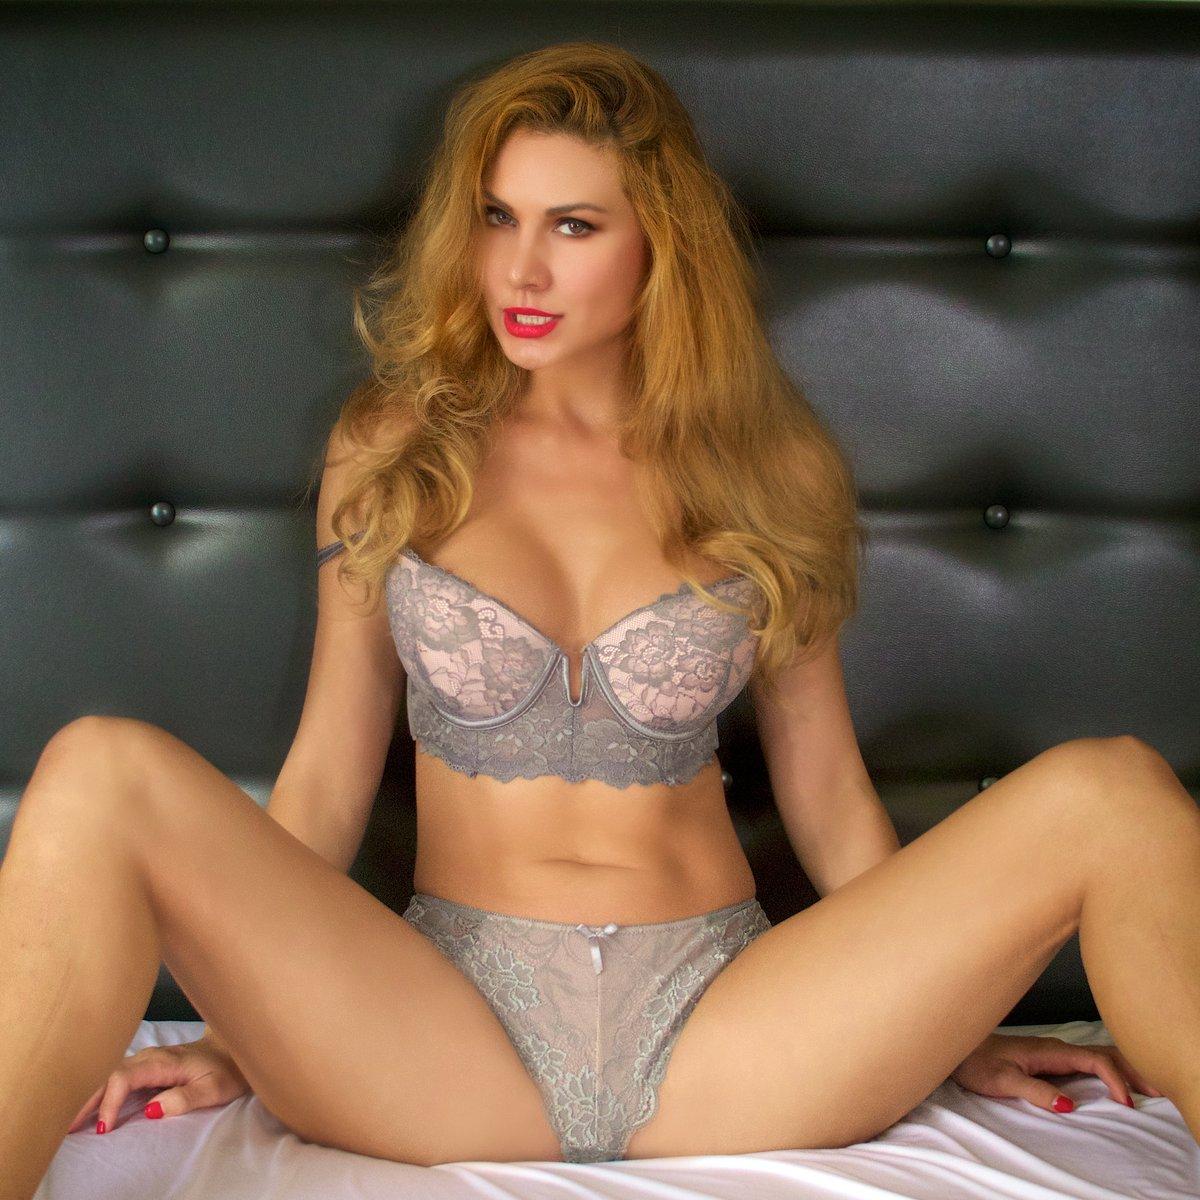 Pics Marina Valmont nude (28 photos), Pussy, Bikini, Feet, swimsuit 2006